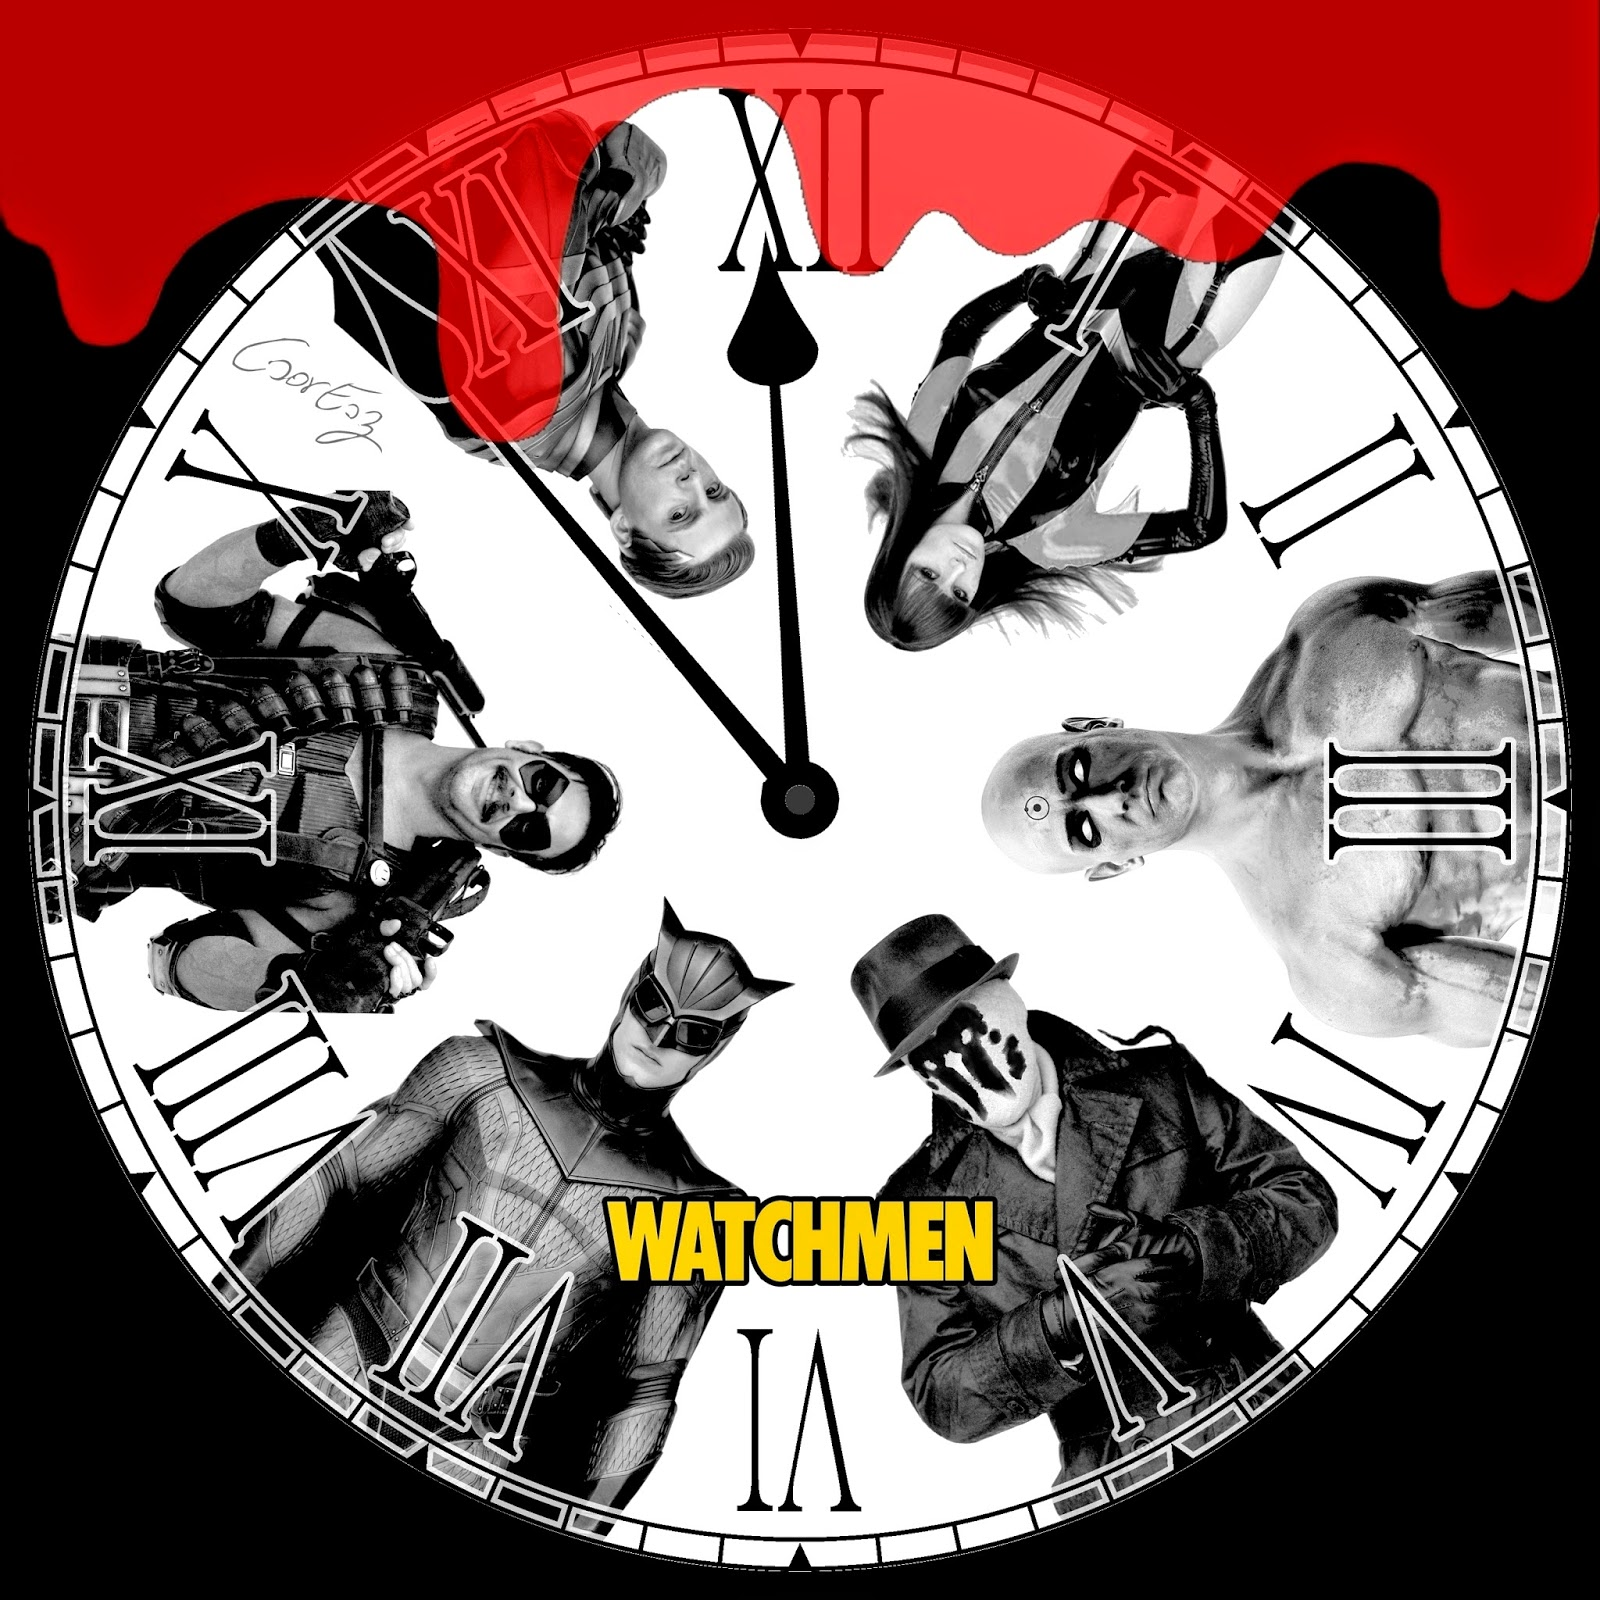 http://csoresz-vilag.blogspot.hu/2014/03/whats-next-on-my-list-watchmen.html